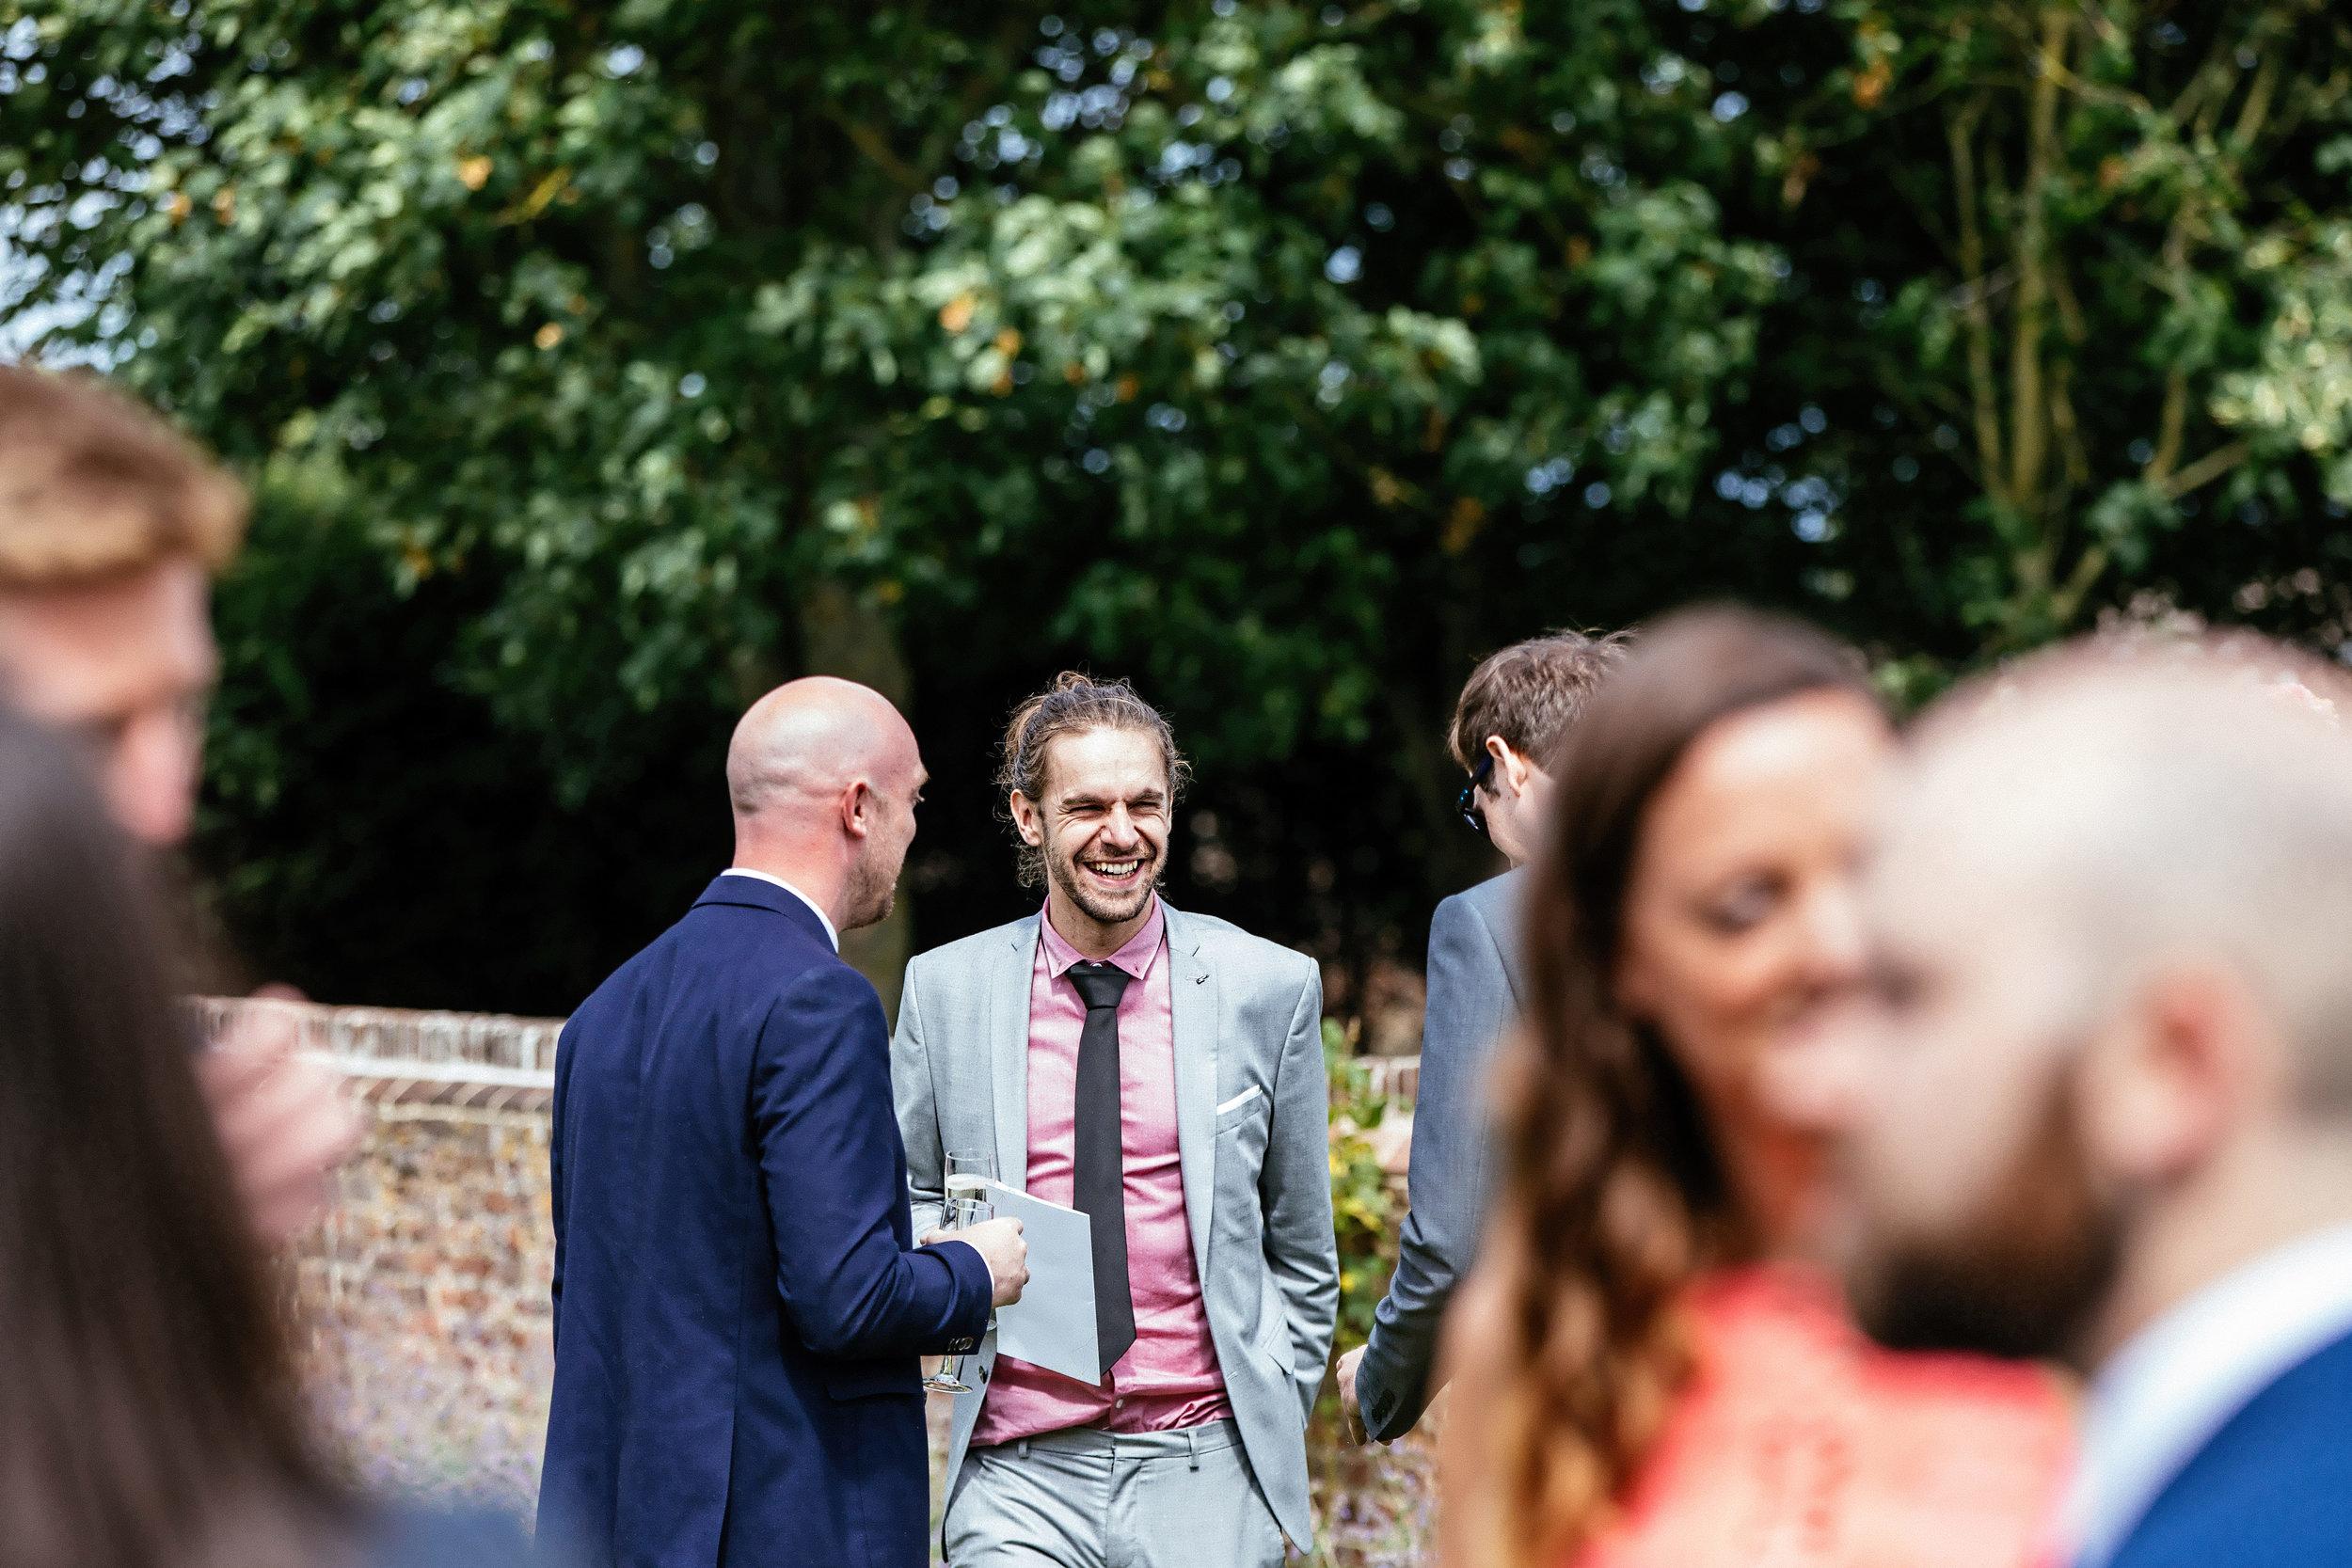 Tamara-and-Richard-Wedding-Highlights-36.jpg